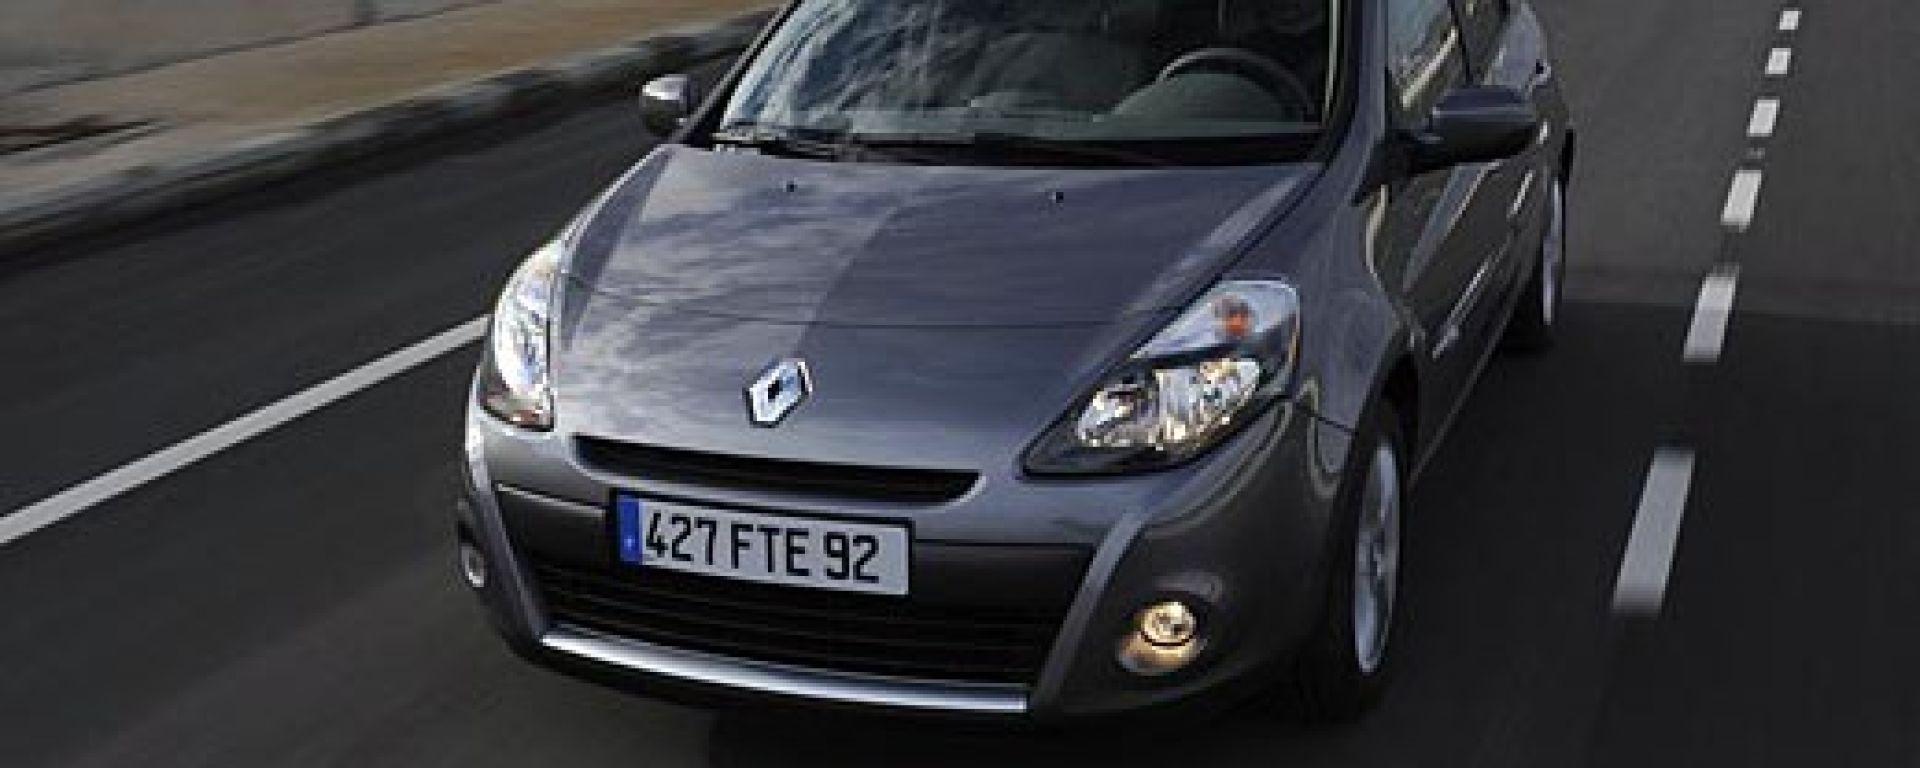 Renault New Clio